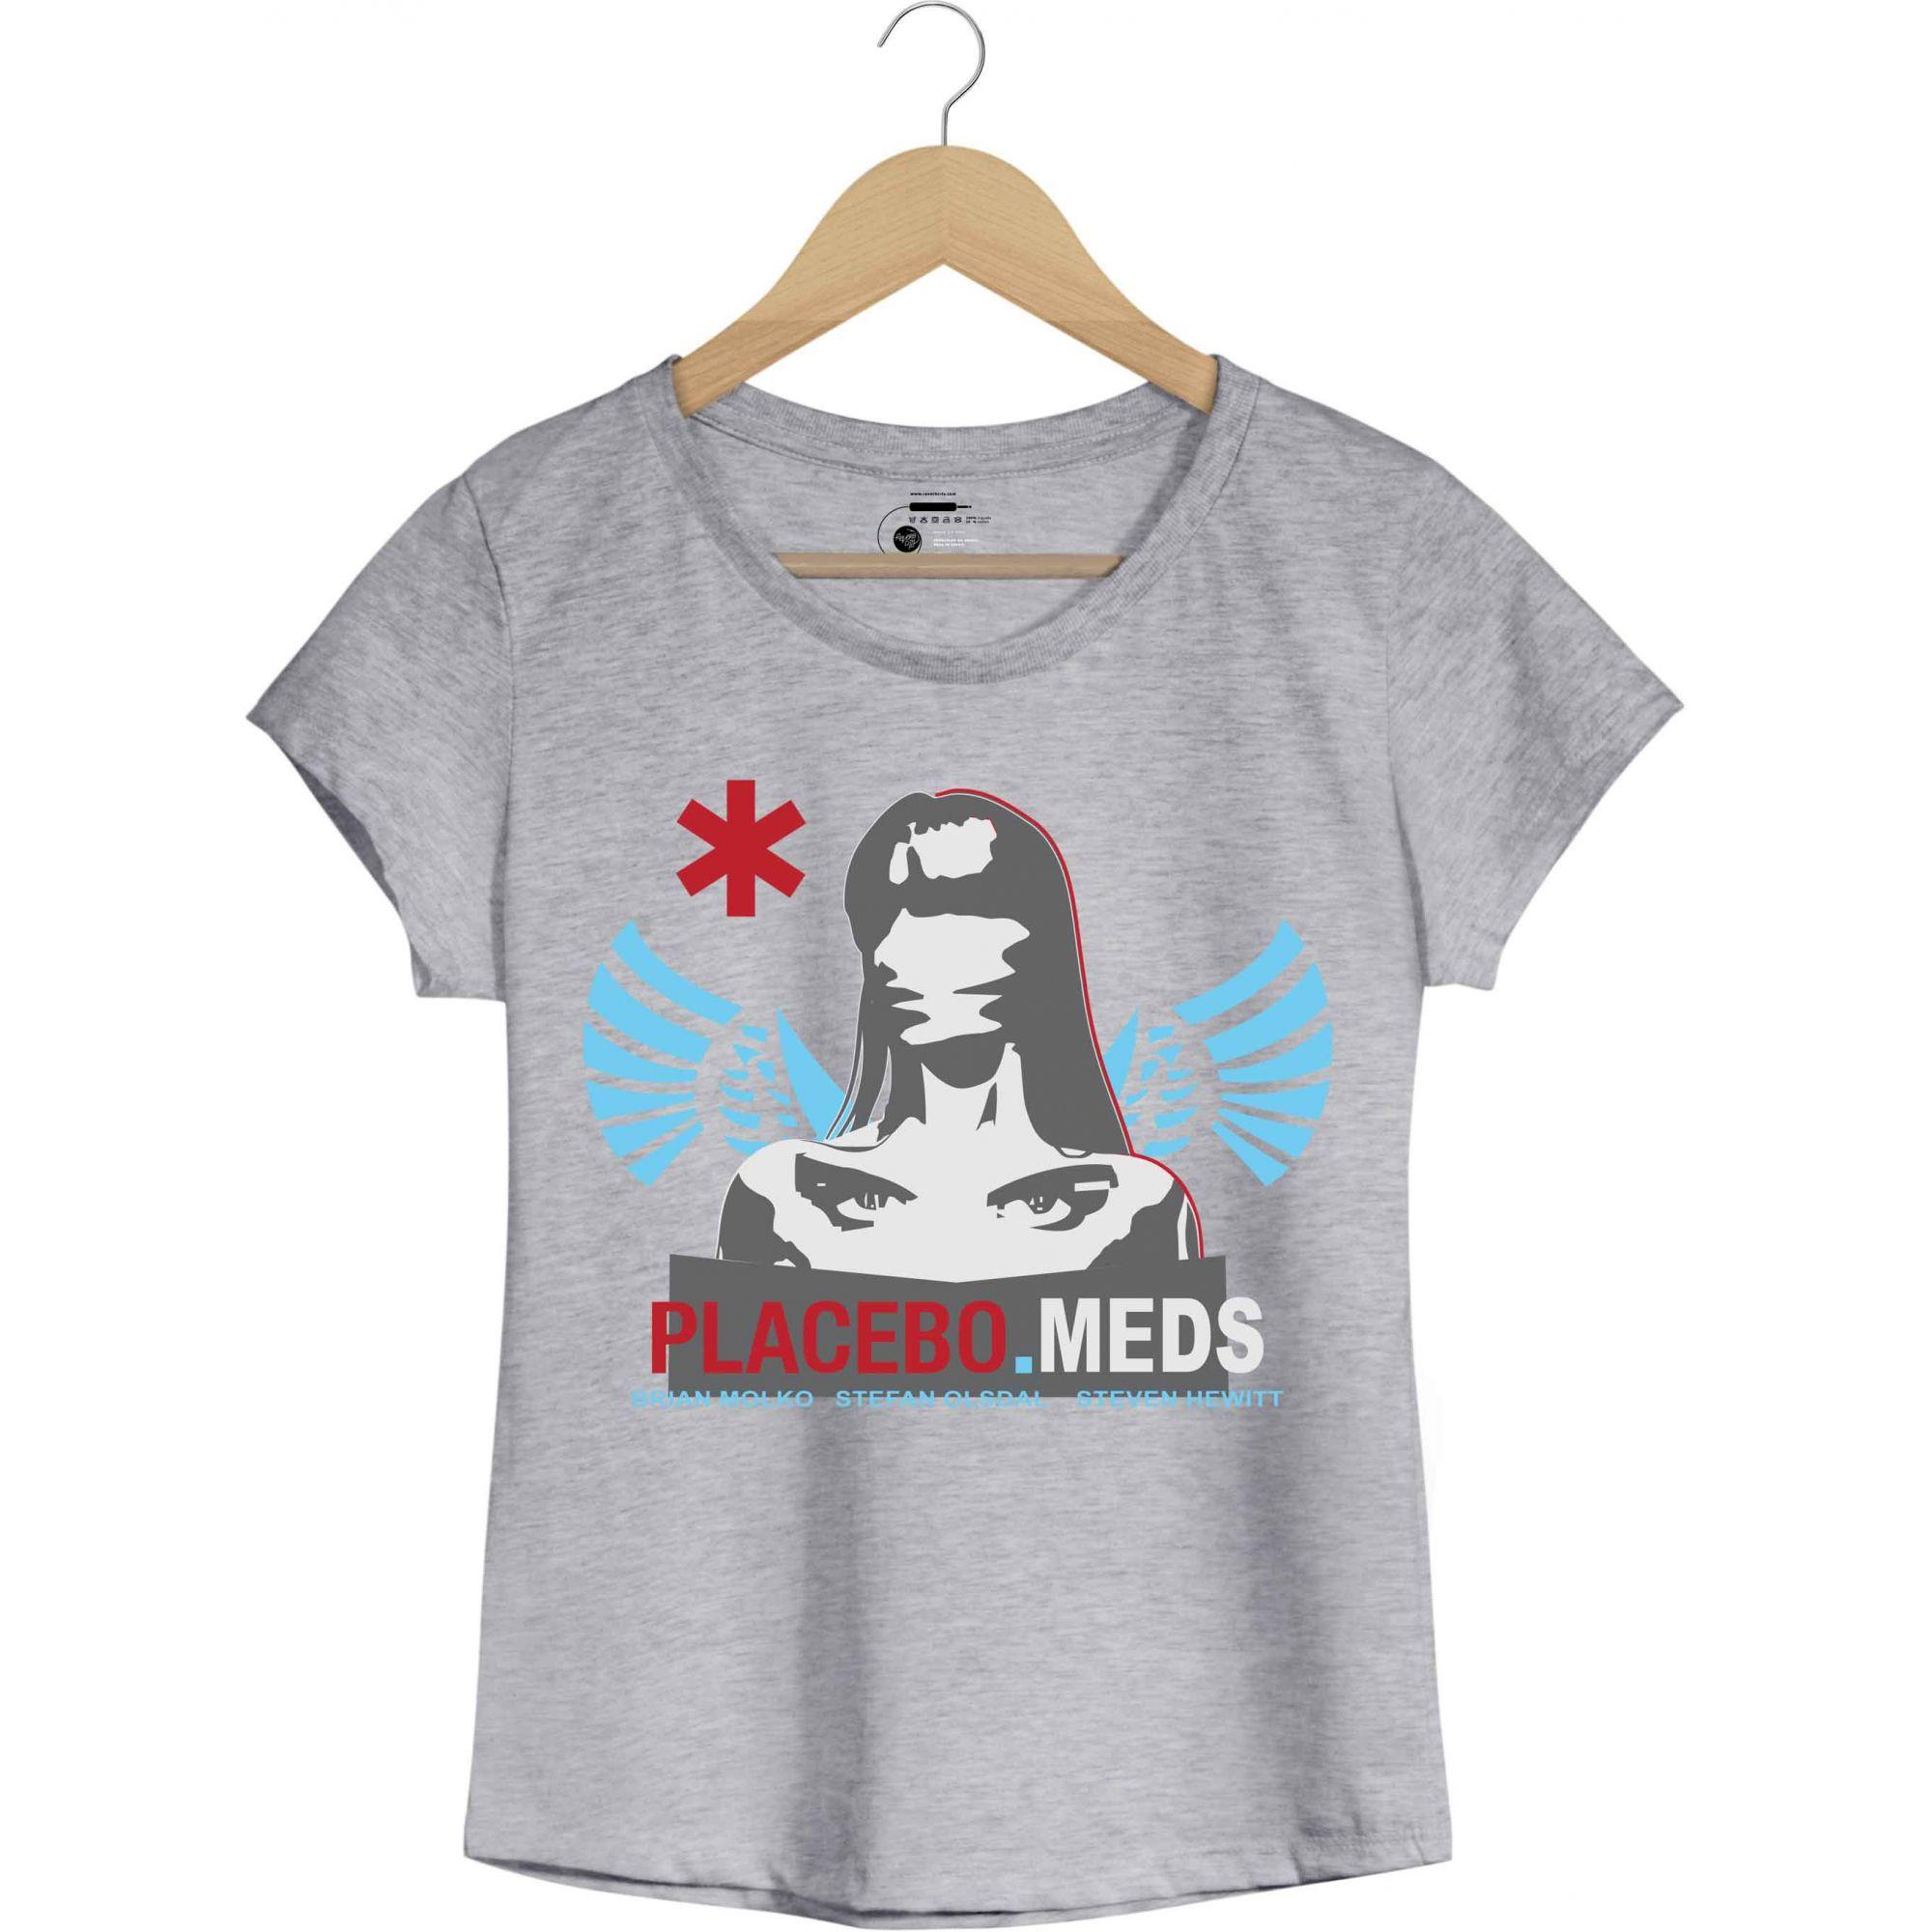 Camiseta - Meds - Placebo - Feminino